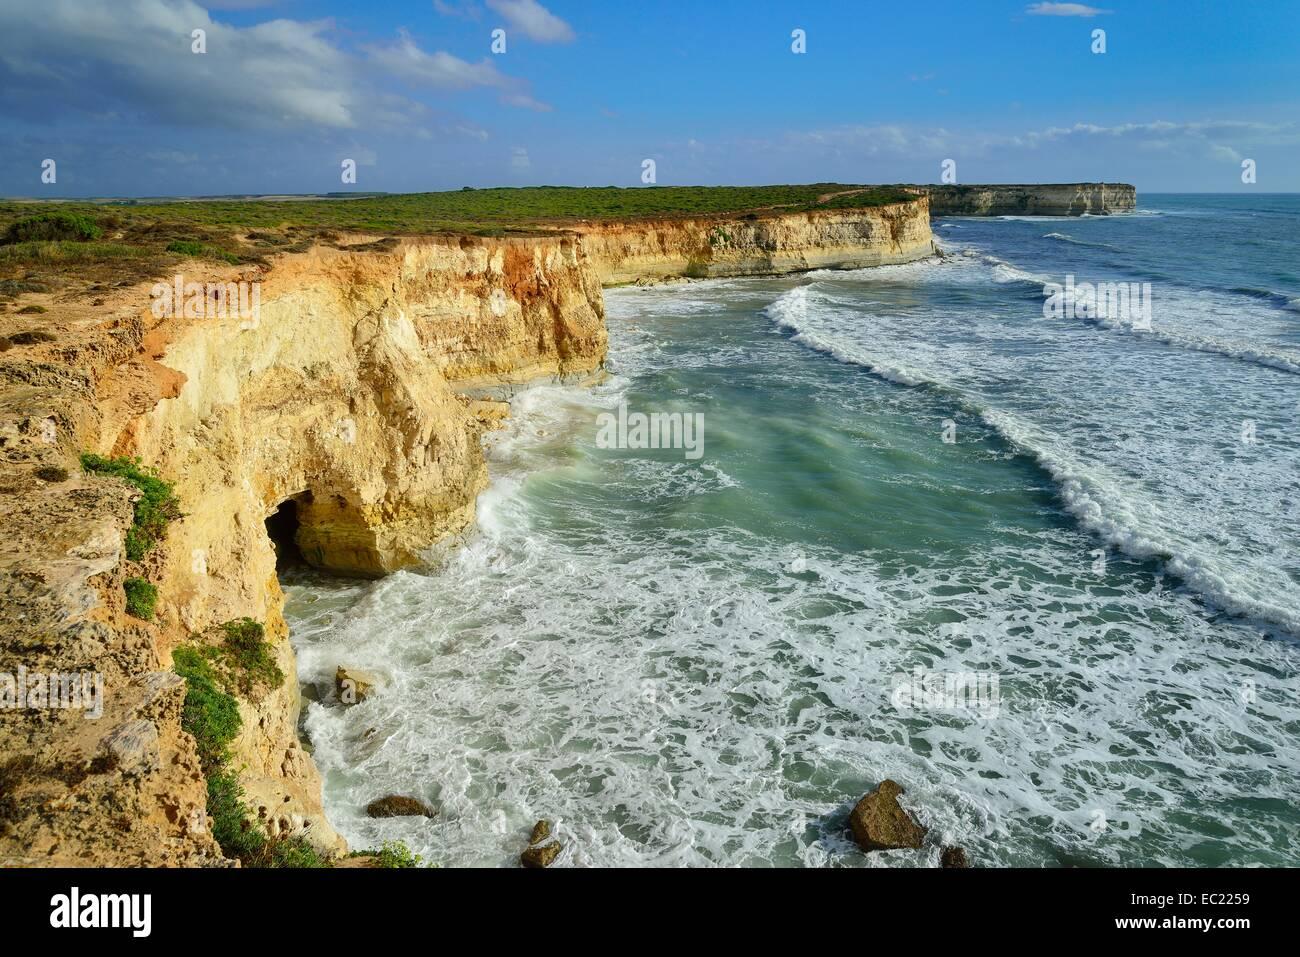 Falaises avec des grottes, Mari Ermi, Péninsule de Sinis, Province de Sassari, Sardaigne, Italie, Europe Photo Stock